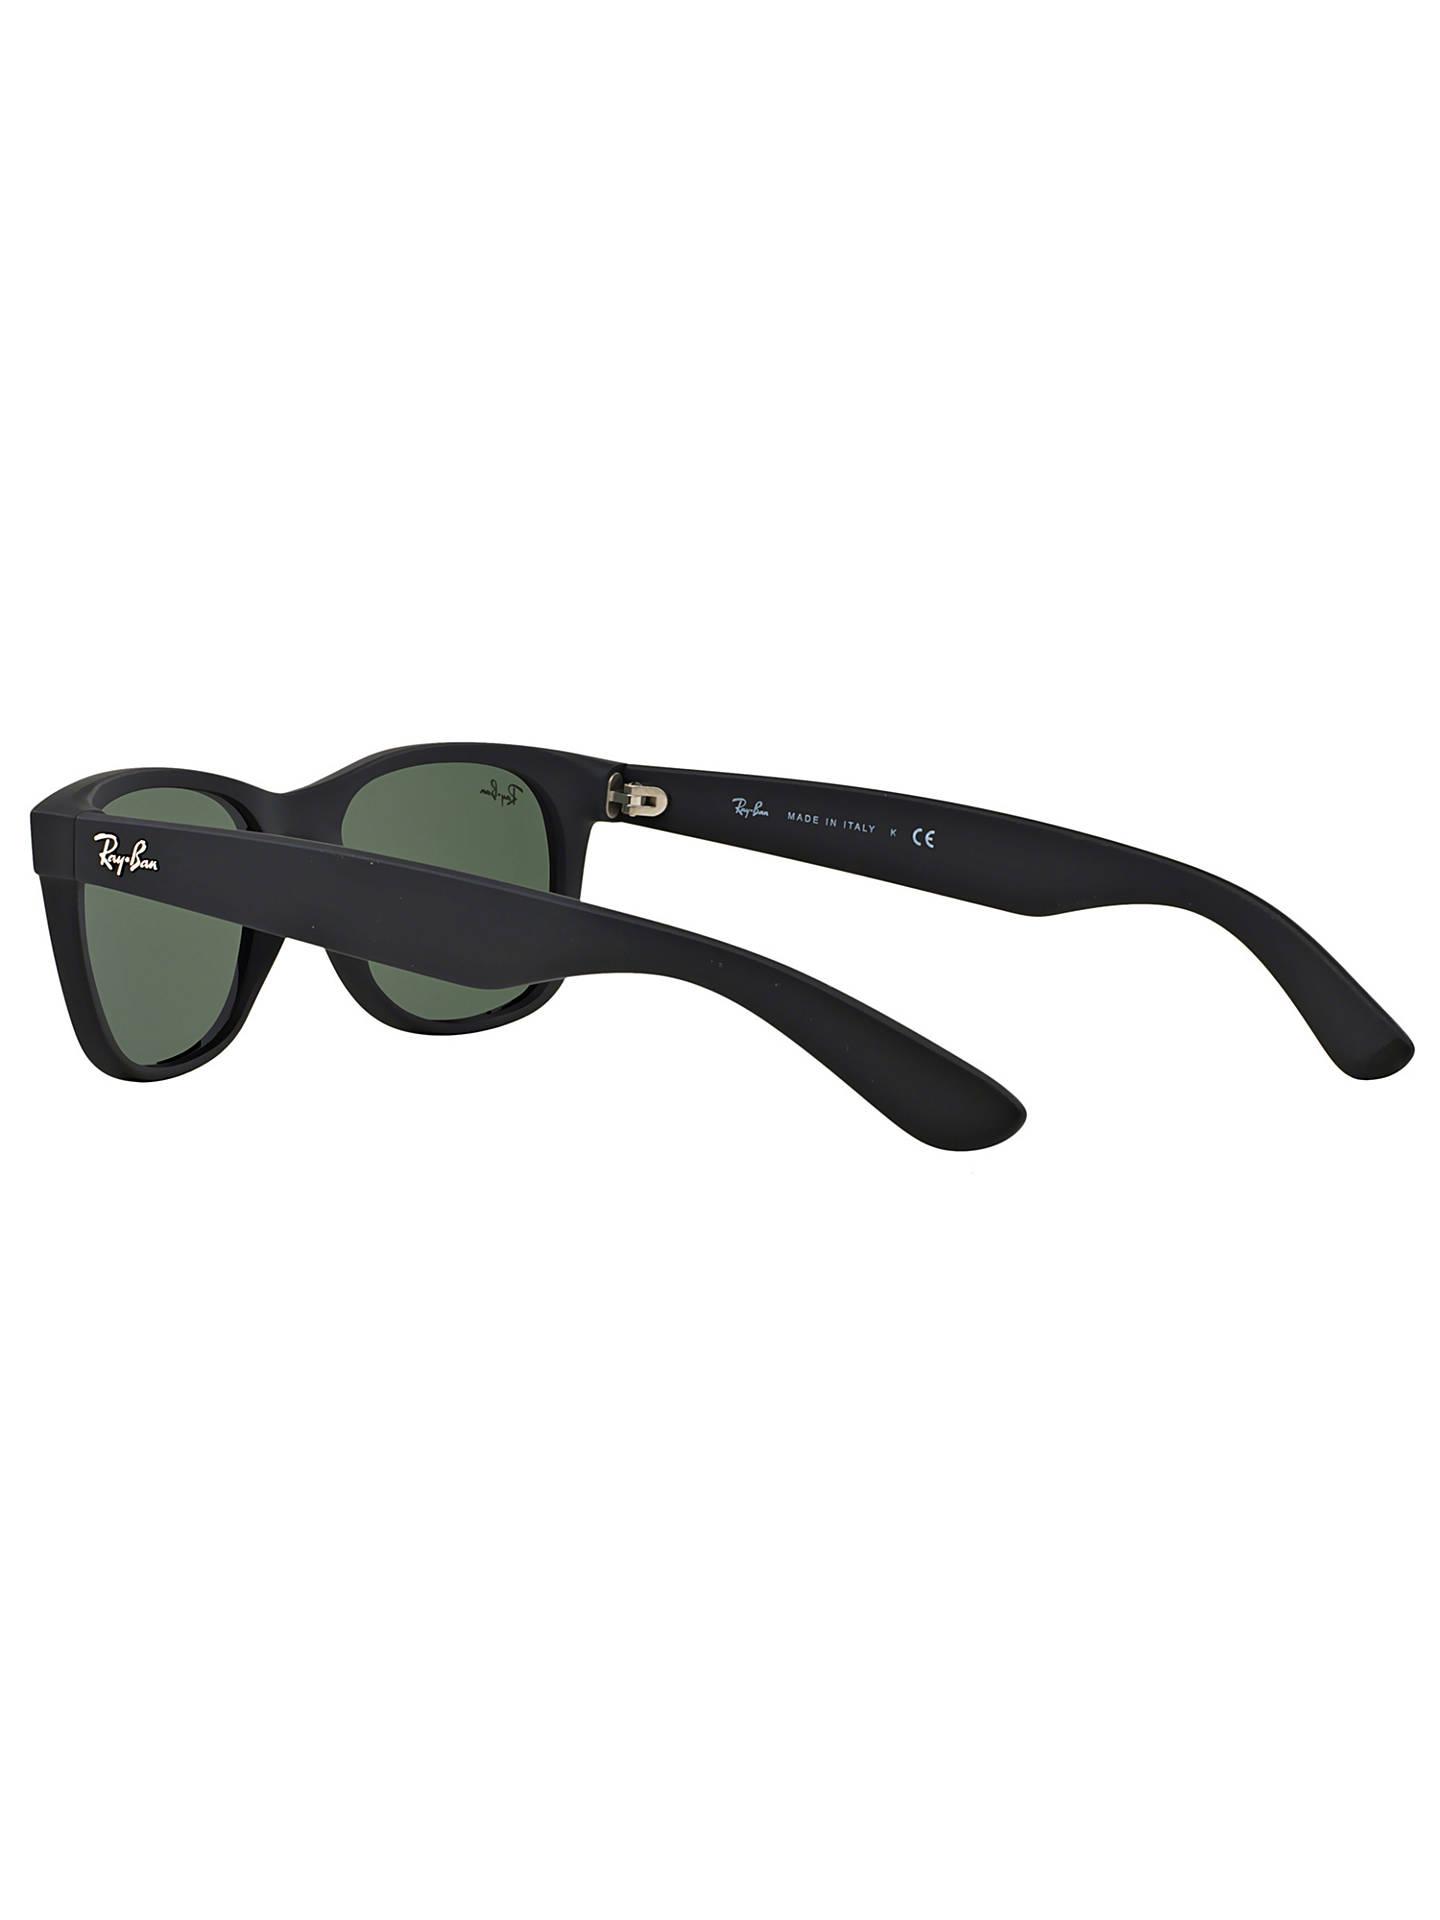 57f5d74835 Ray-Ban RB2132 New Wayfarer Sunglasses at John Lewis   Partners